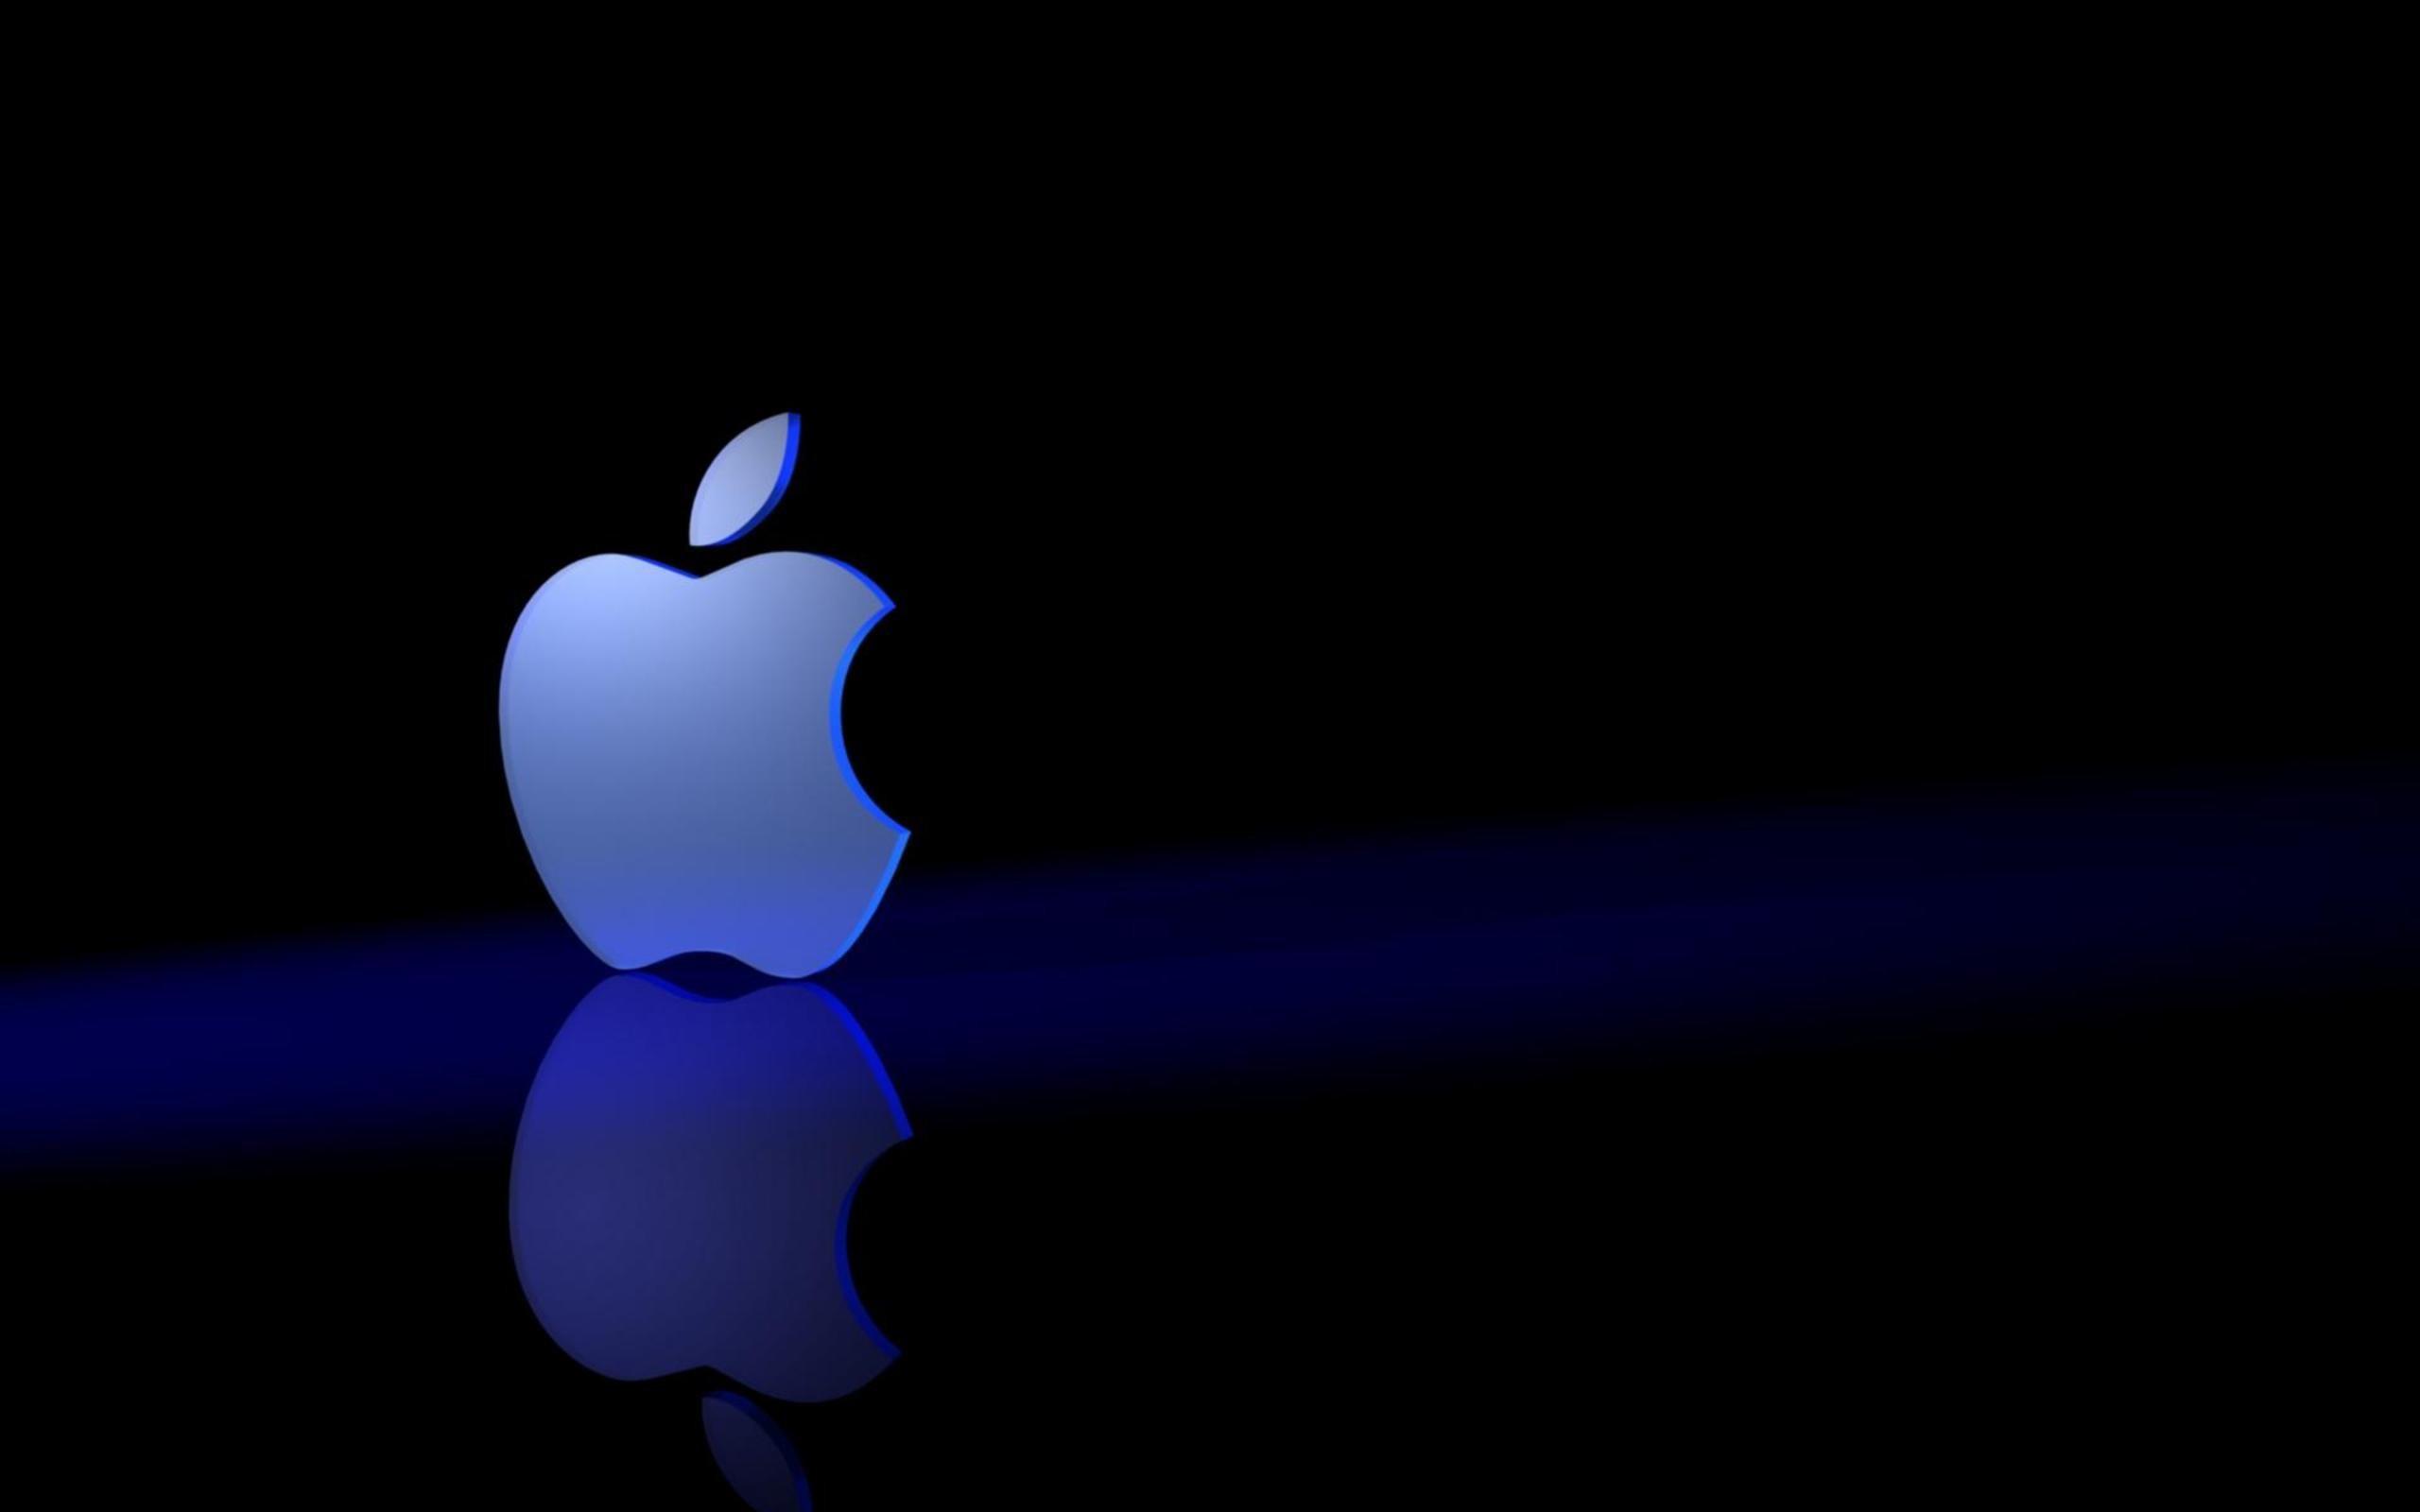 Download 8000 Wallpaper Apple Picture  Gratis